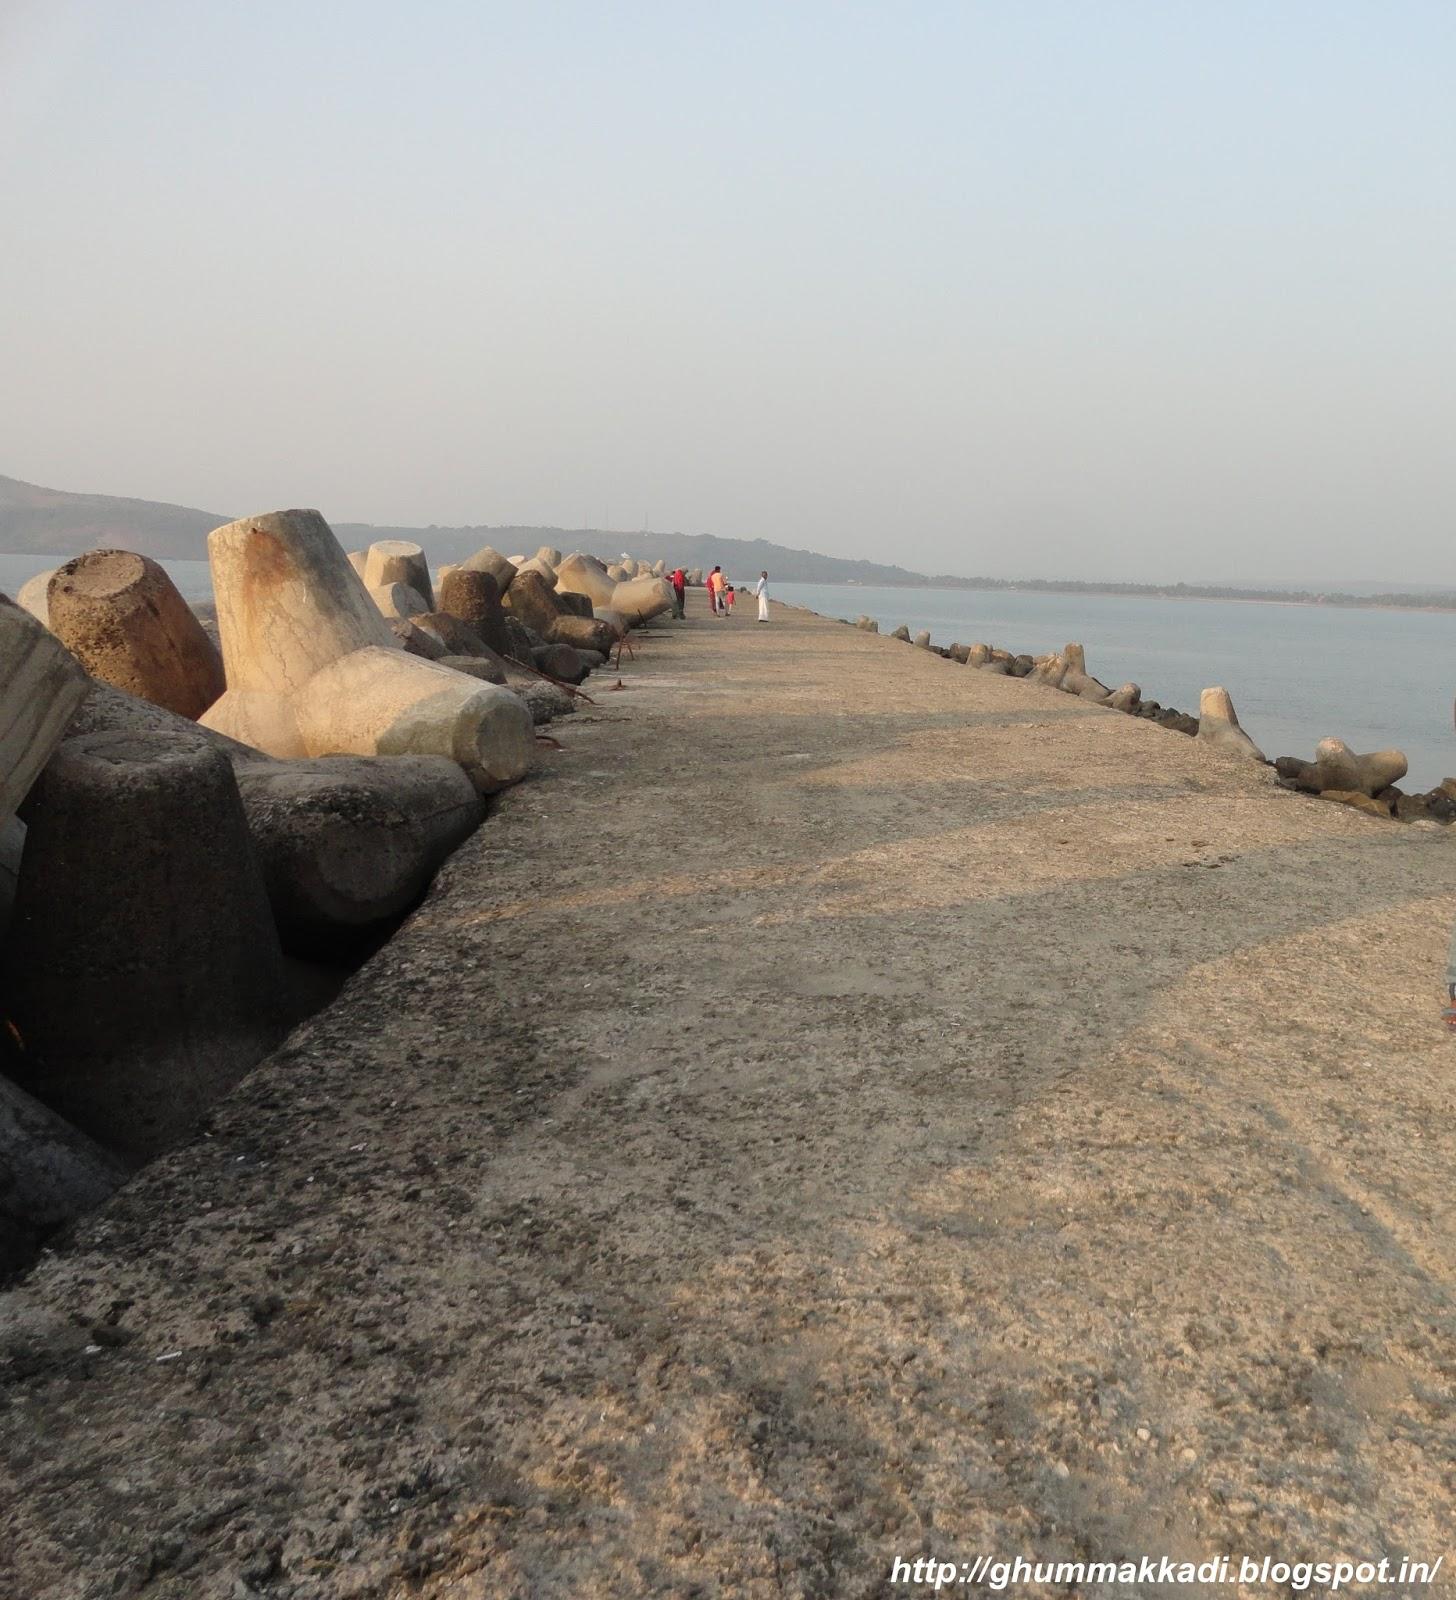 Ratnagiri City At Ratnagiri Maharashtra India: Ghumakkadi: Pune To Ratnagiri Trip Day 2: Ratnadurg Fort